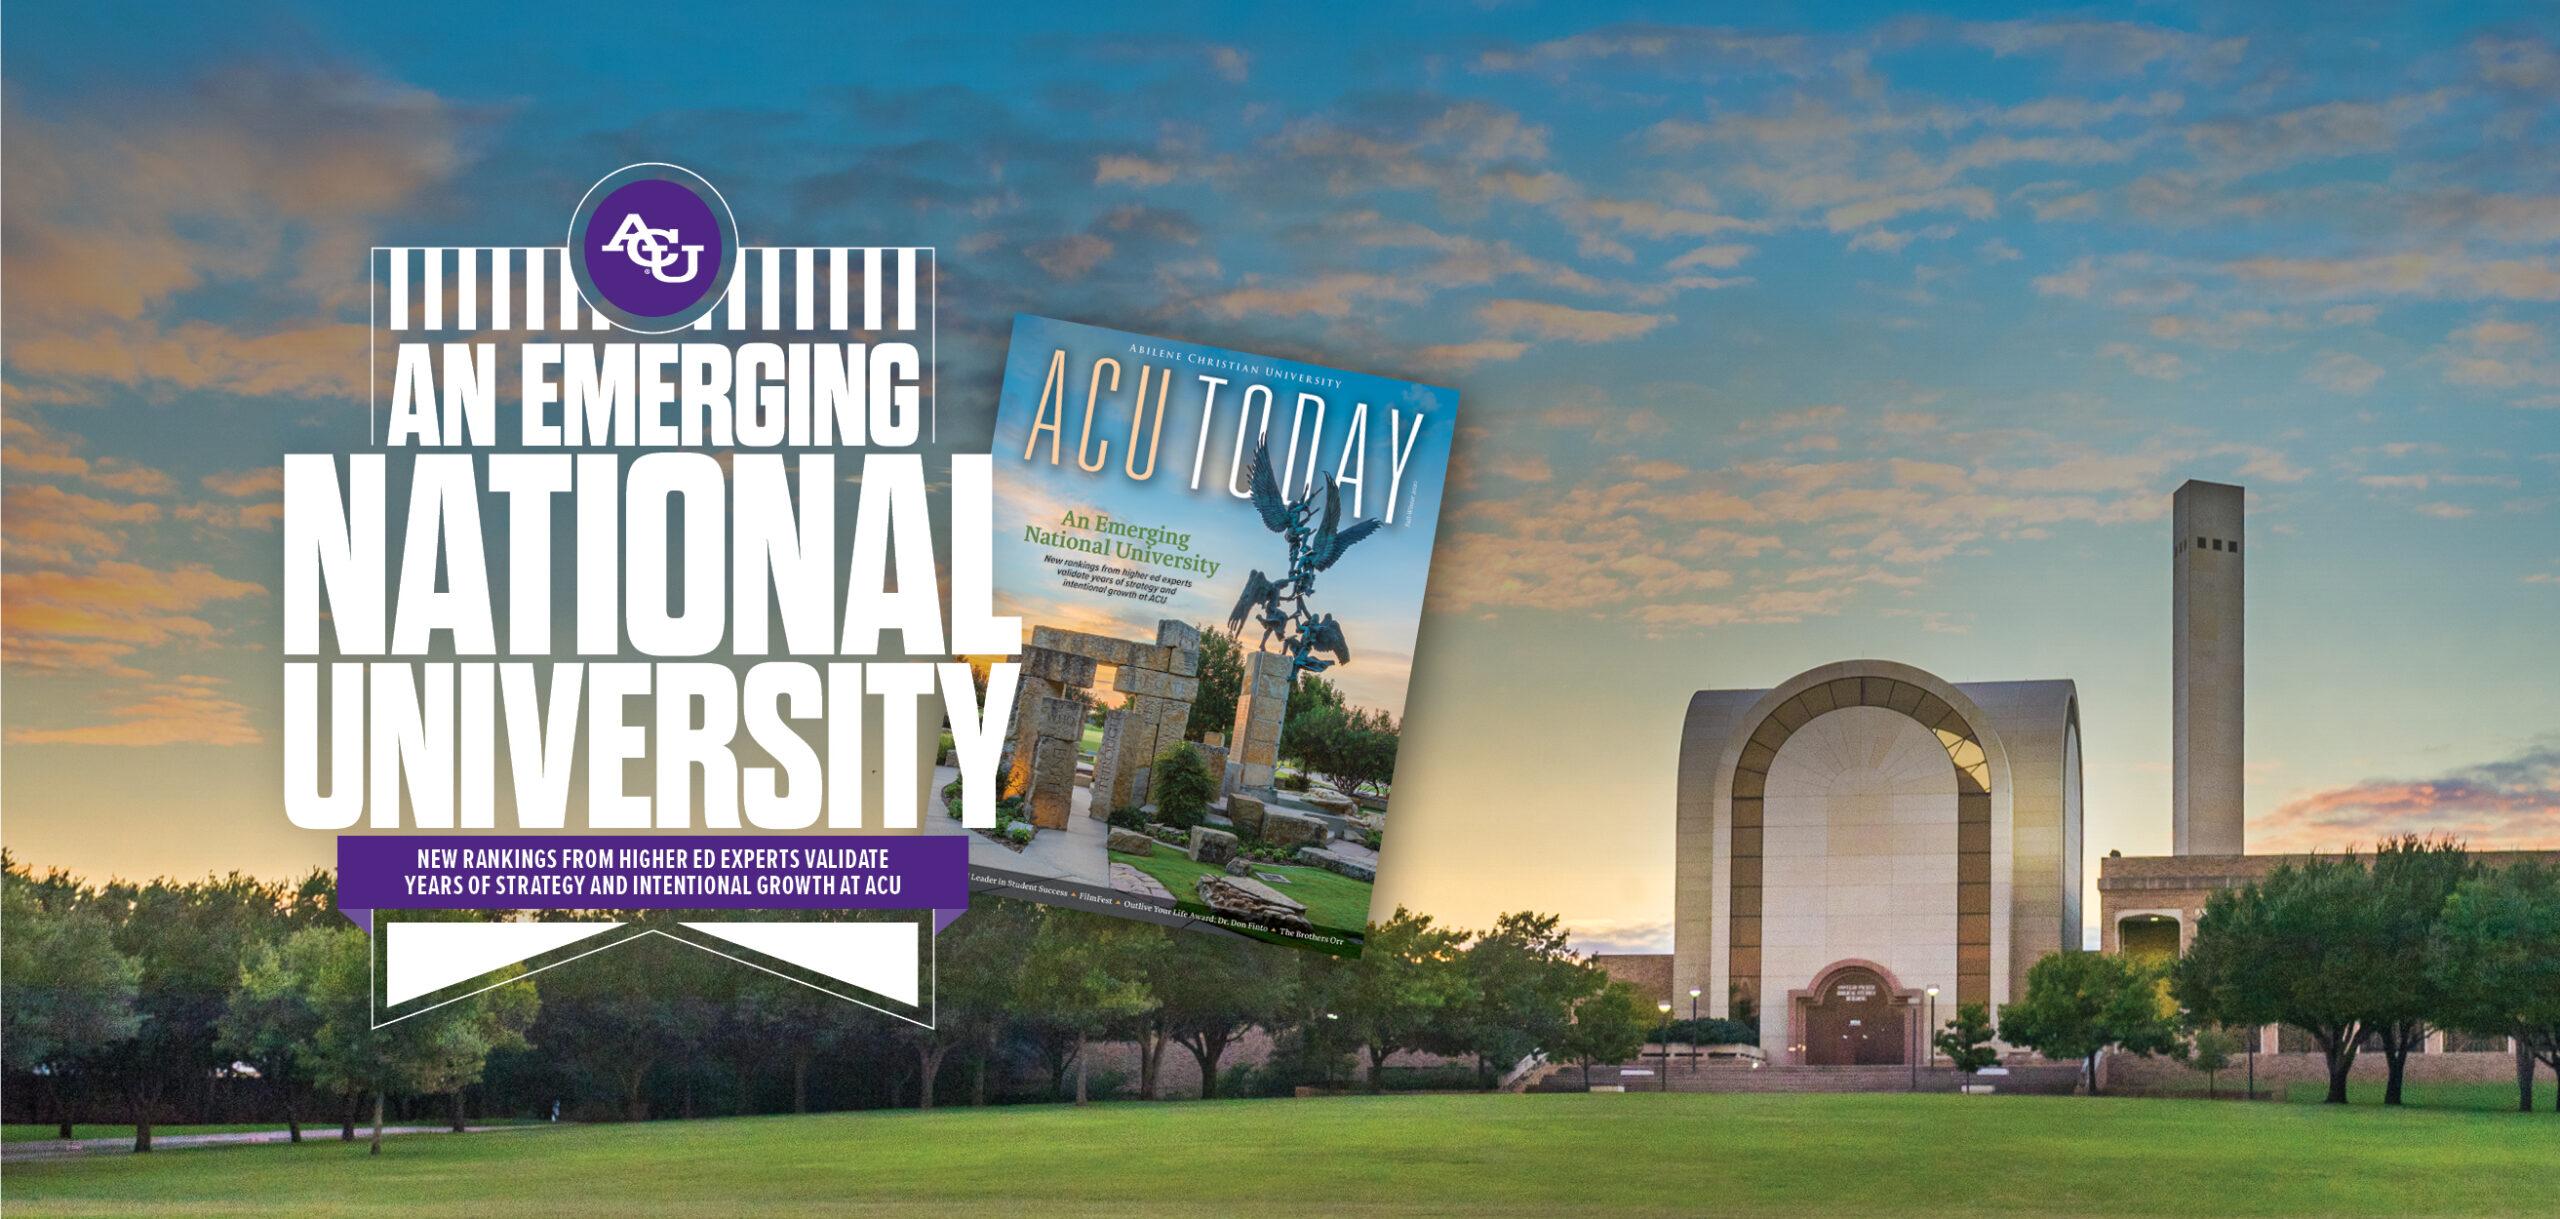 New Issue Explores Acu S Growing National Reputation Acu Today Abilene Christian University Acu Today Abilene Christian University